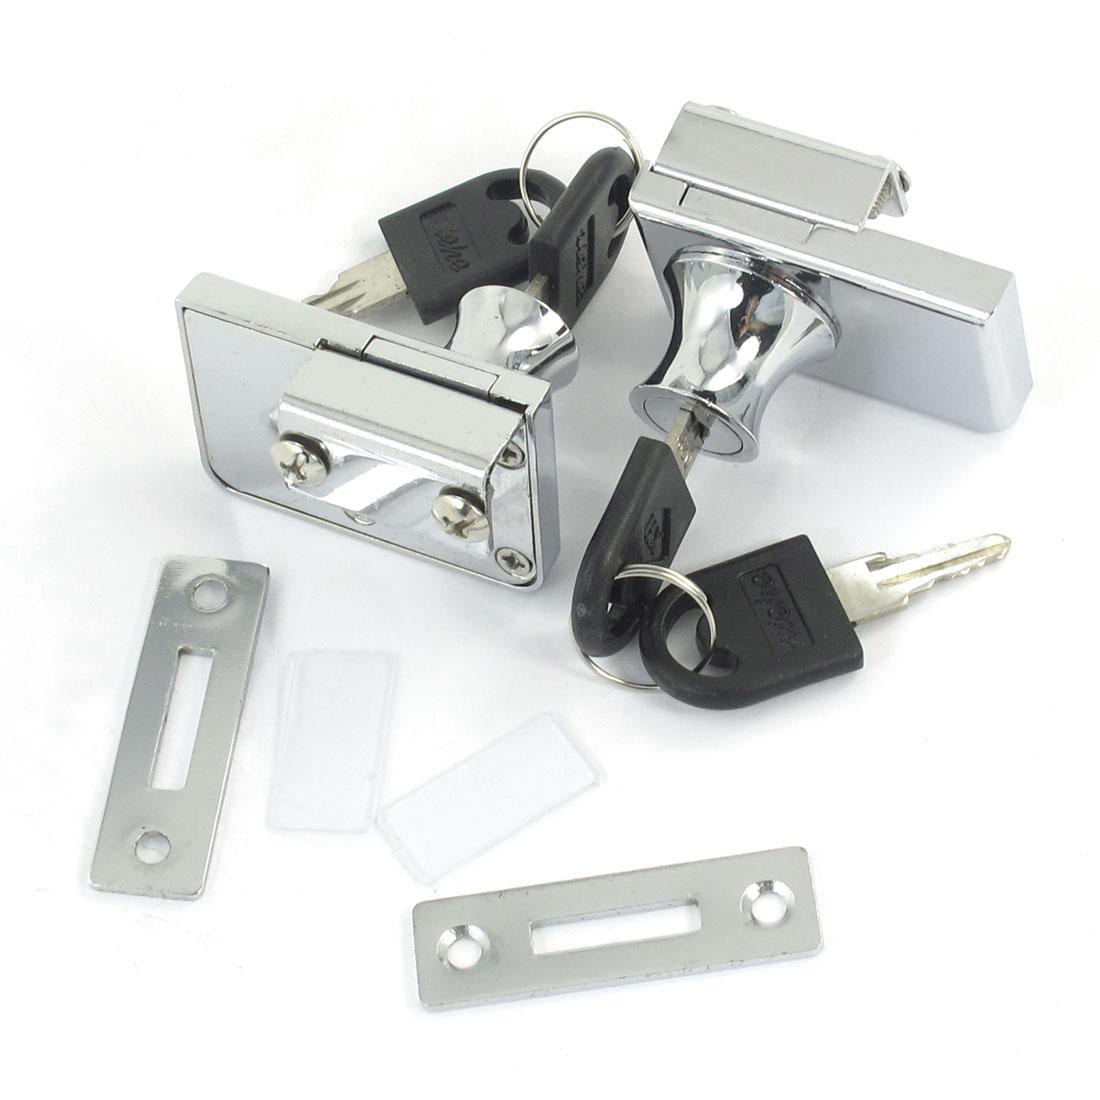 2 Pcs Silver Tone Metal Desk Drawer Cupboard Locking Lock w Keys